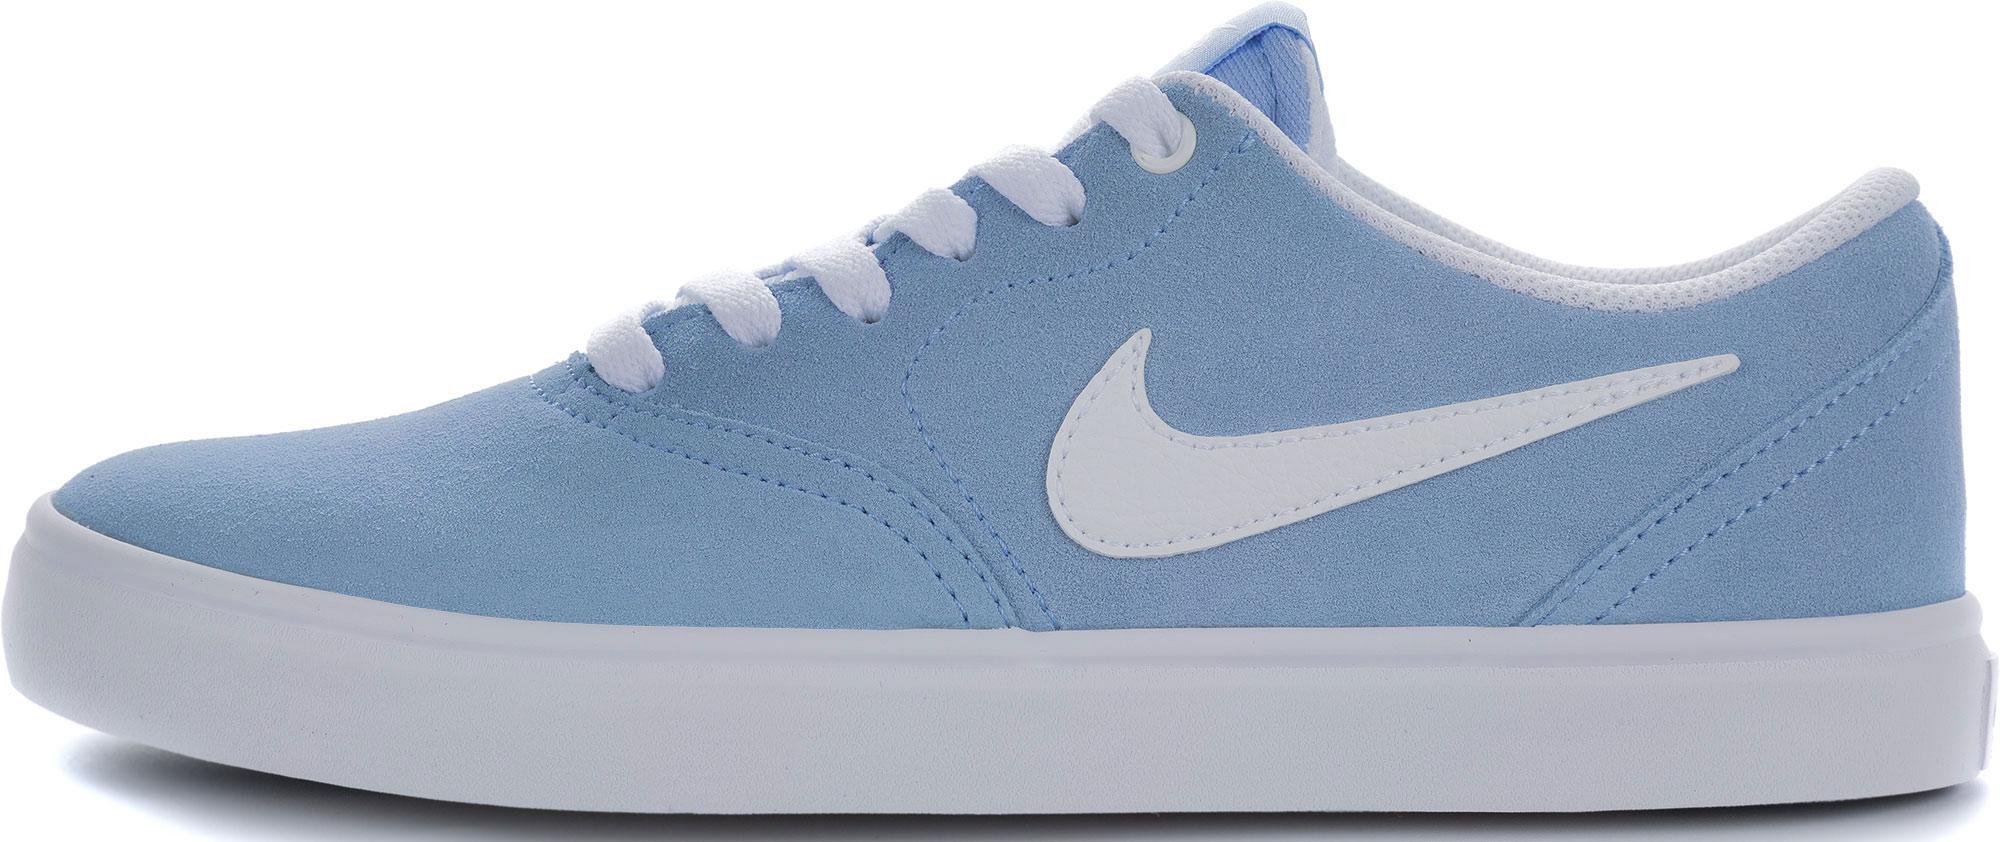 Nike Кеды женские Check Solar, размер 37,5